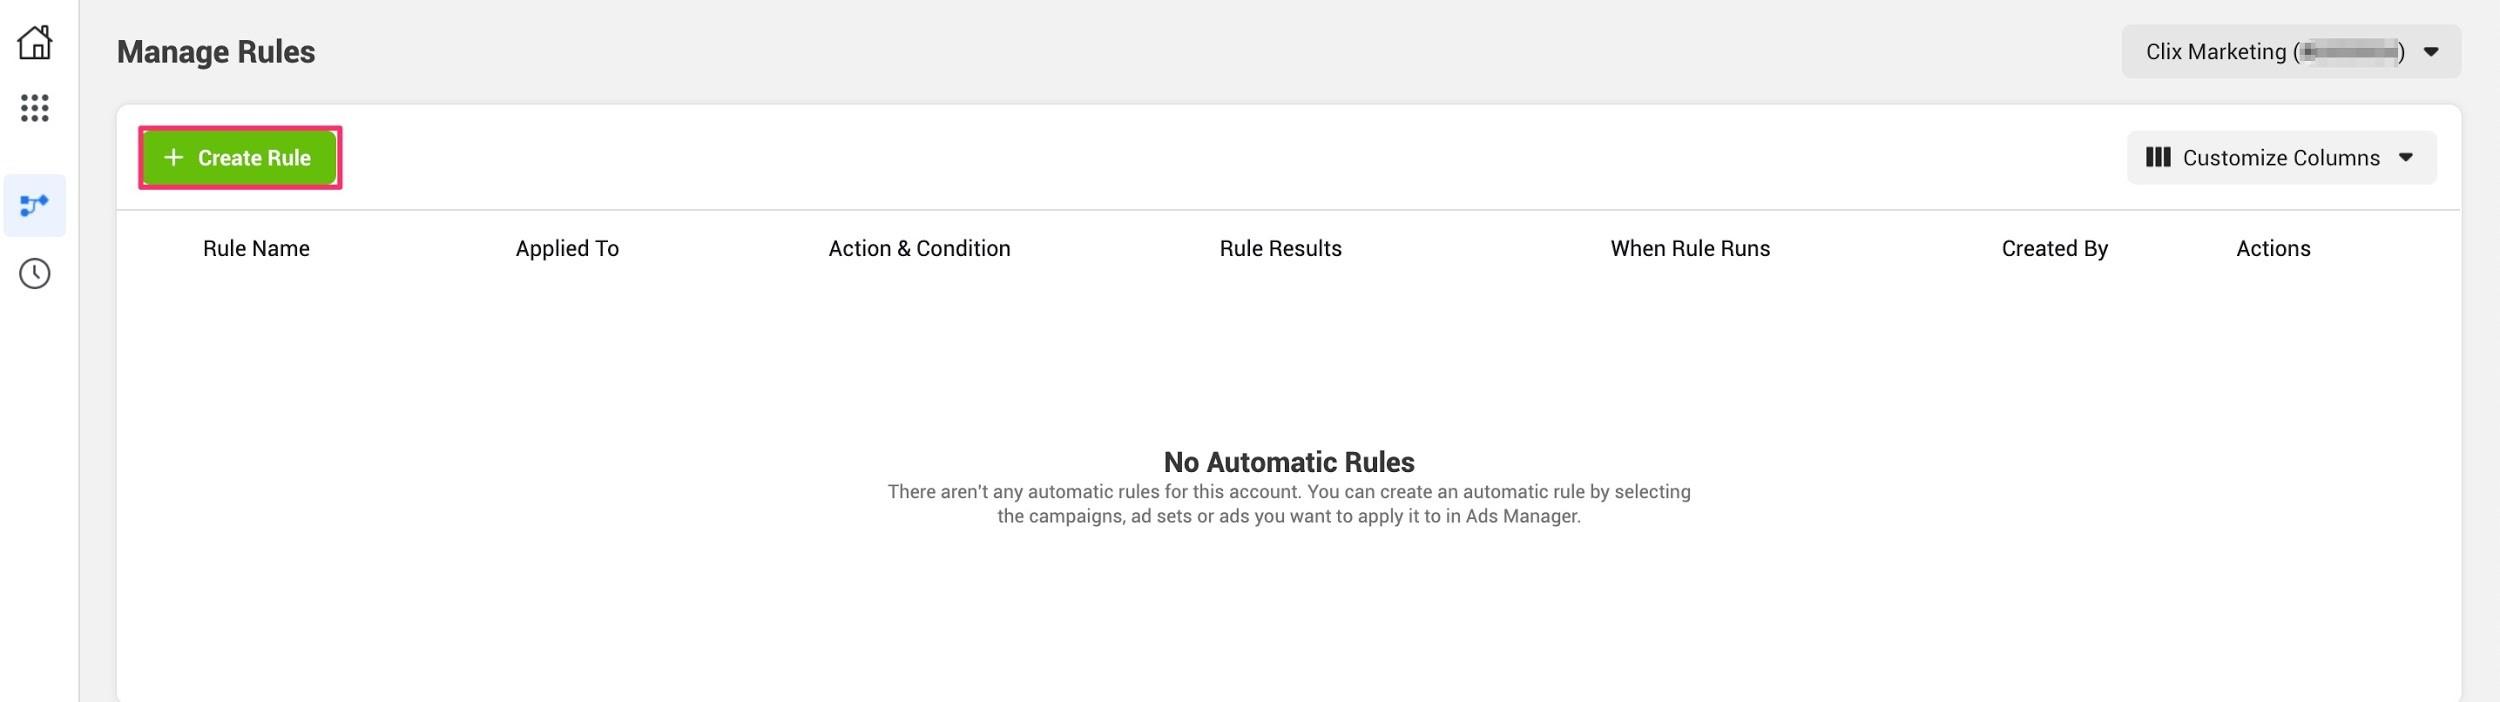 Managing Rules.